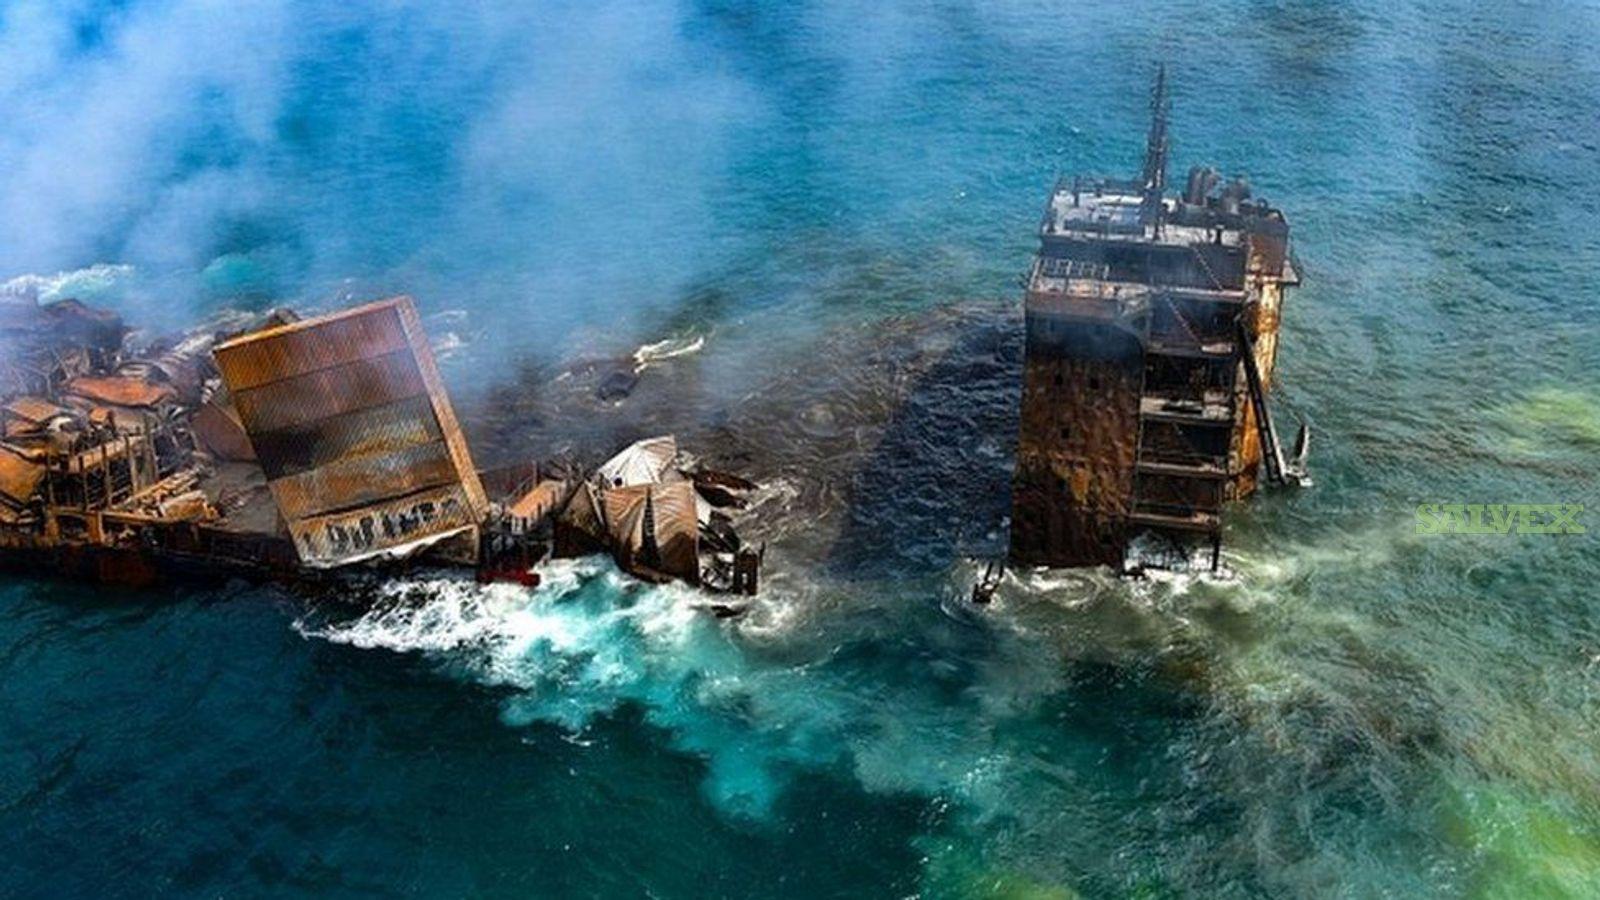 Singapore-Registered Super Eco 2700-Class Container Ship- Fire Damaged (1 Unit)